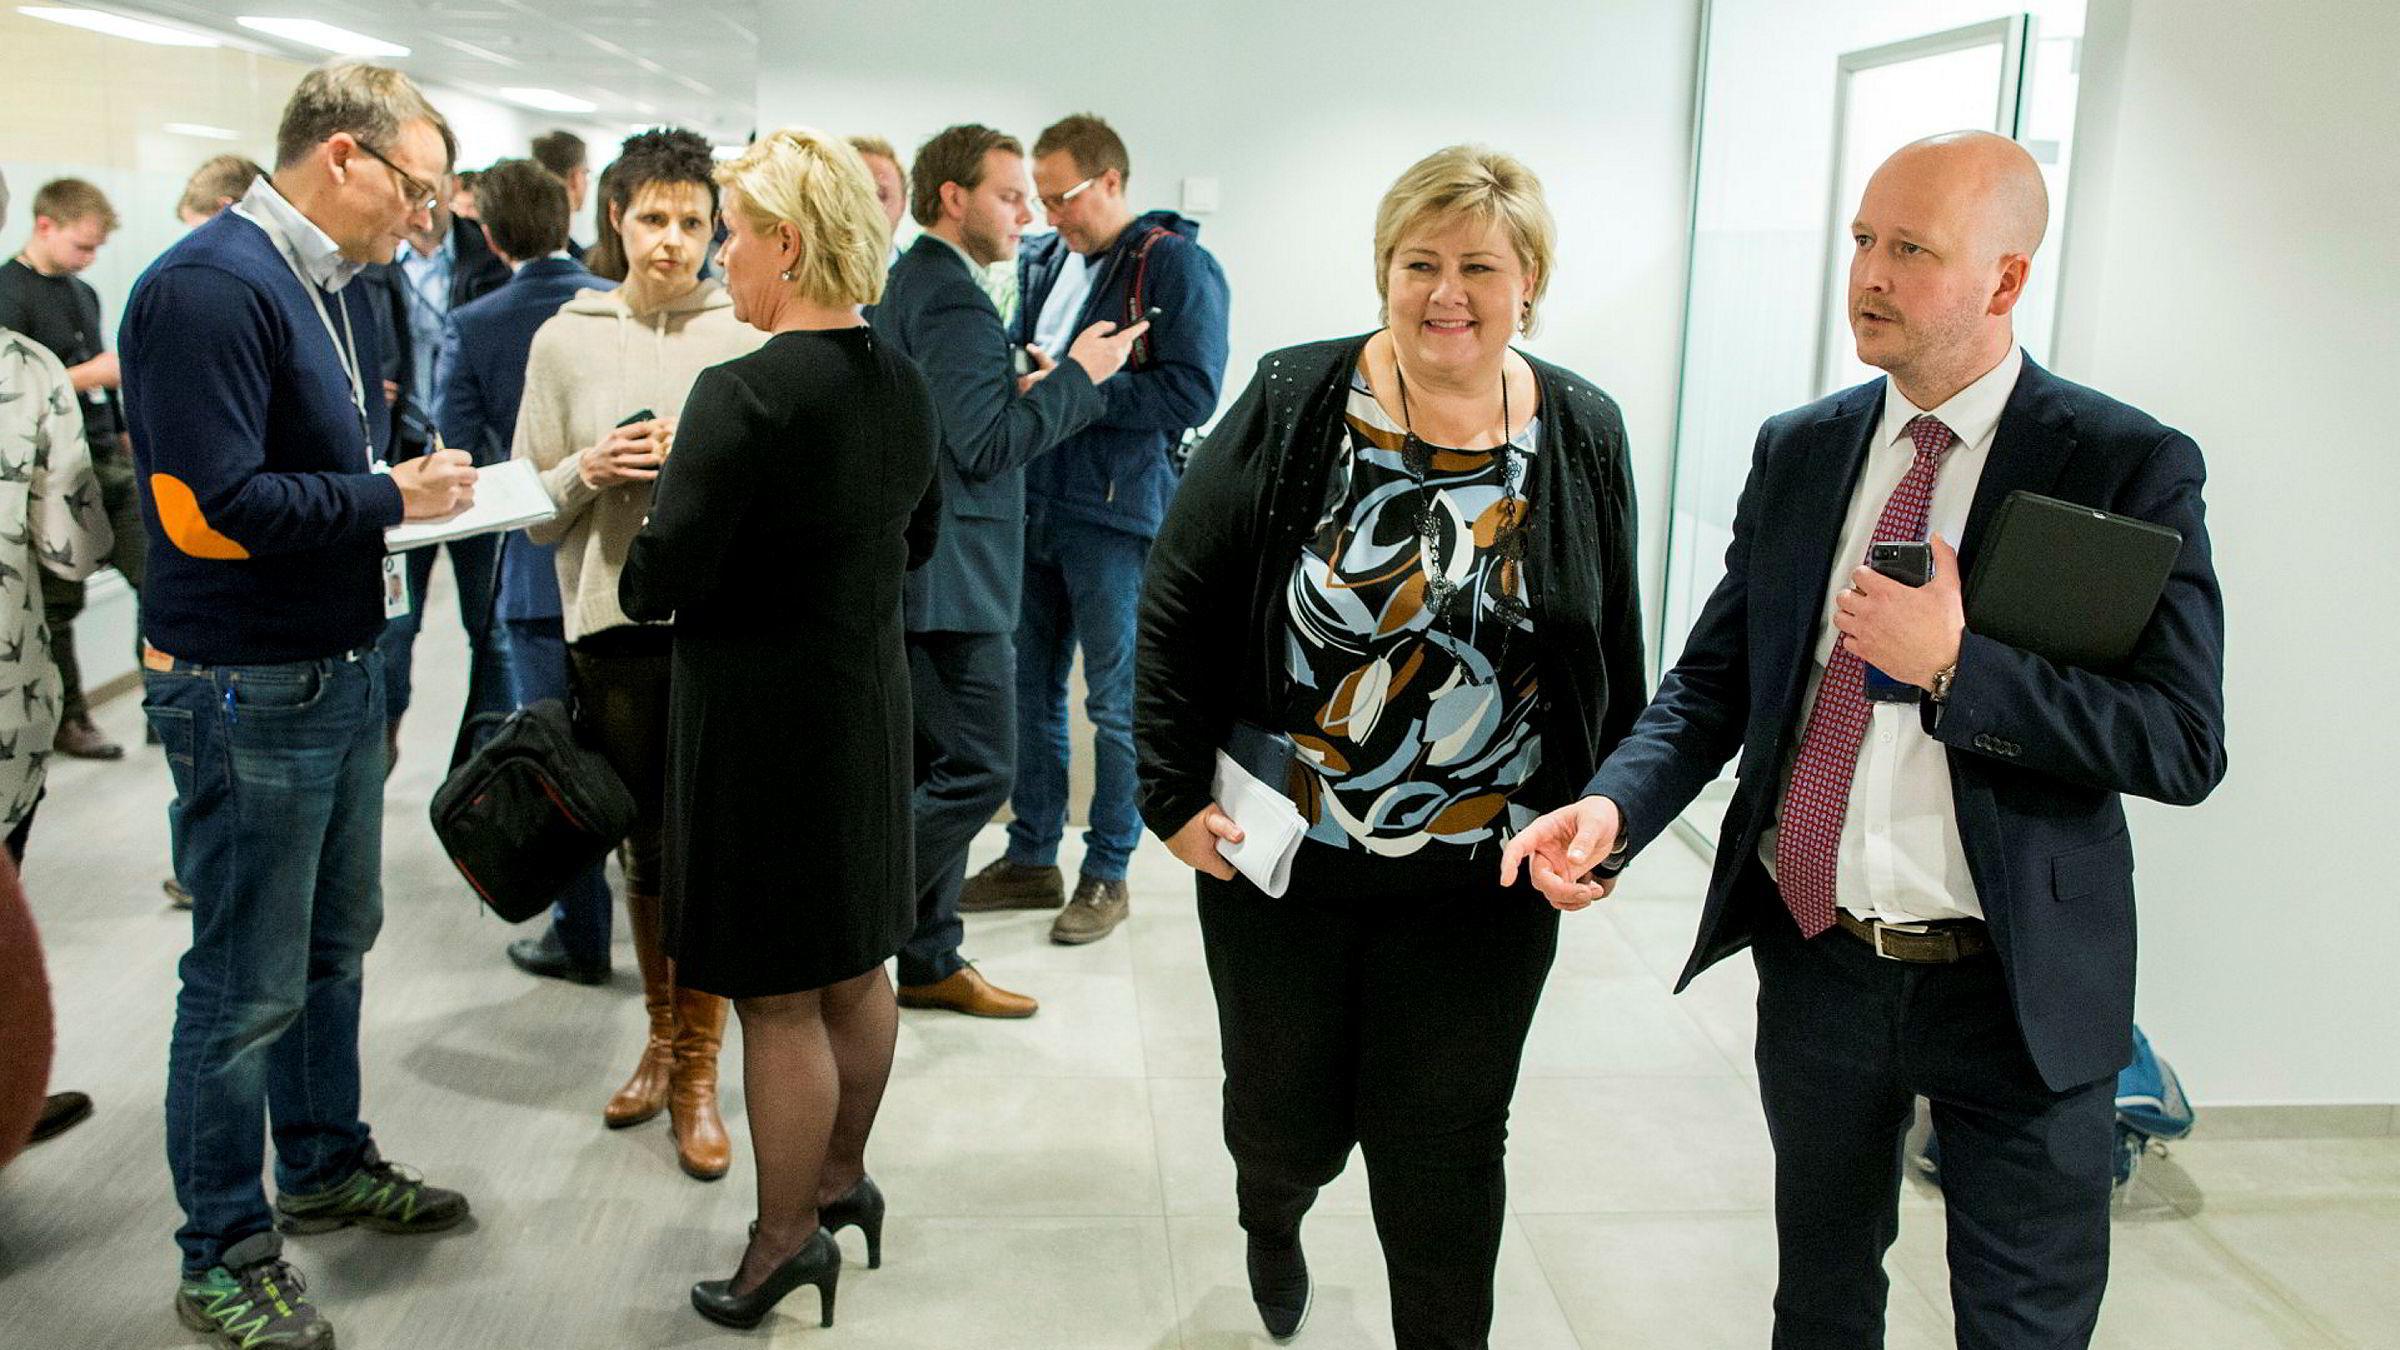 Statsminister Erna Solberg forlater pressekonferansen lørdag kveld. Foto: Vegard Wivestad Grøtt / NTB scanpix